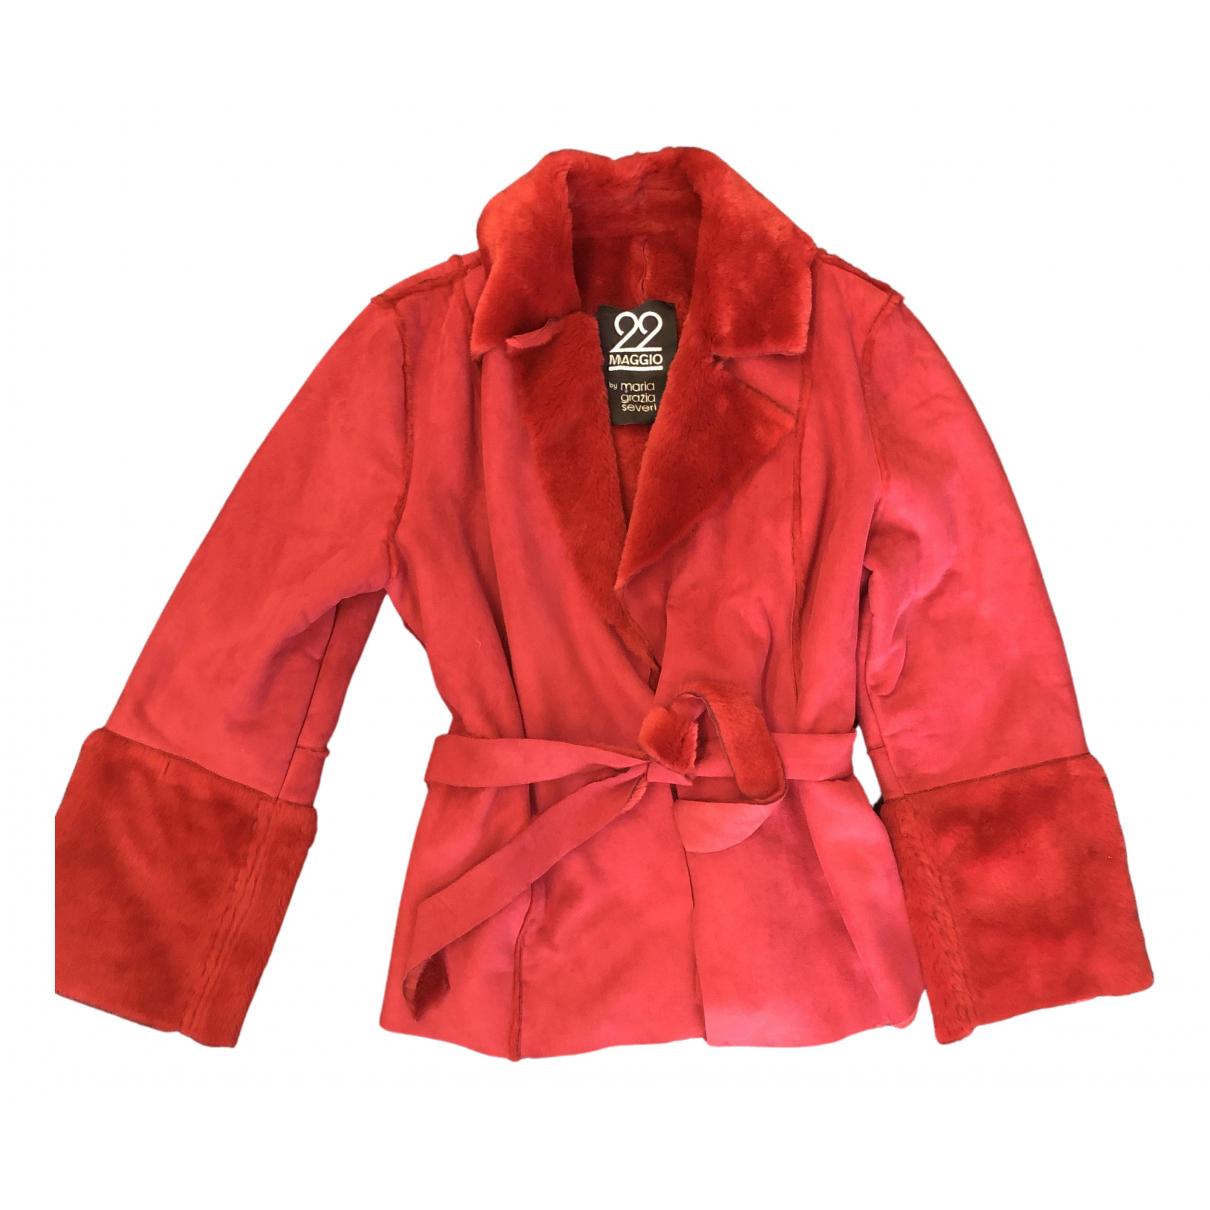 Maria Grazia Severi N Red coat for Women 46 IT